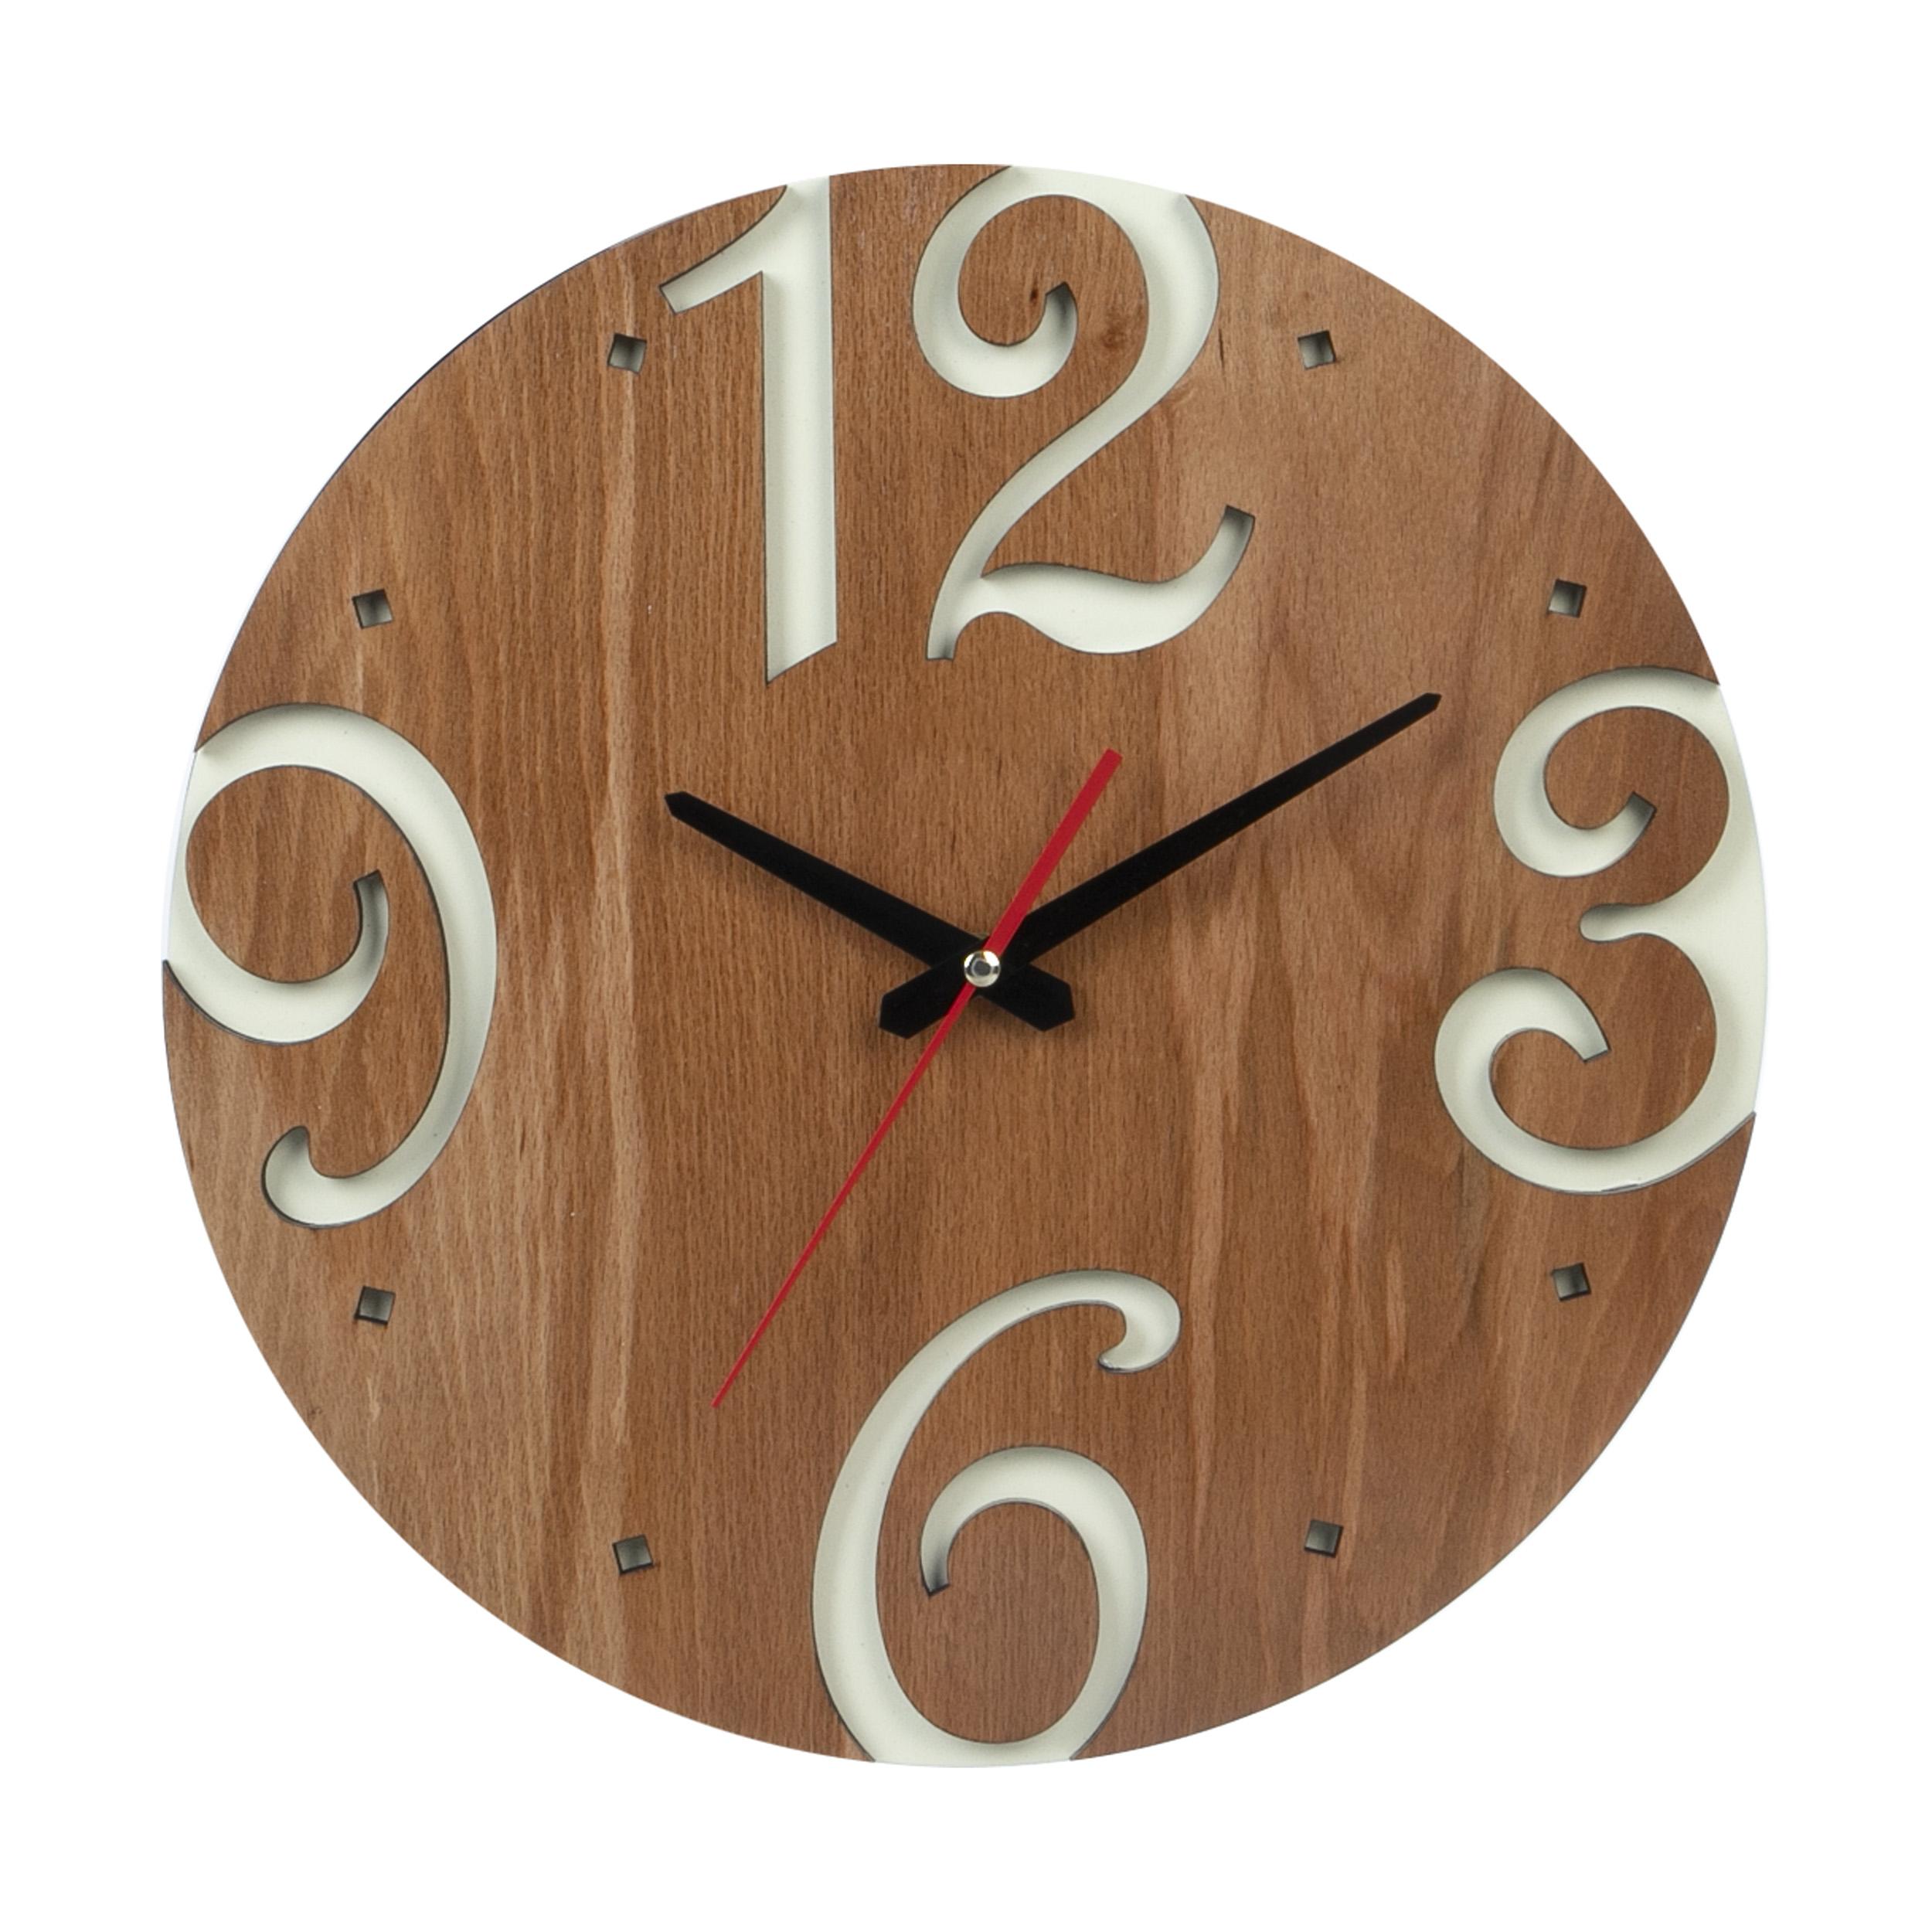 ساعت دیواری معرق کاری هُم آدیس مدل KITA کد CK 605-CK